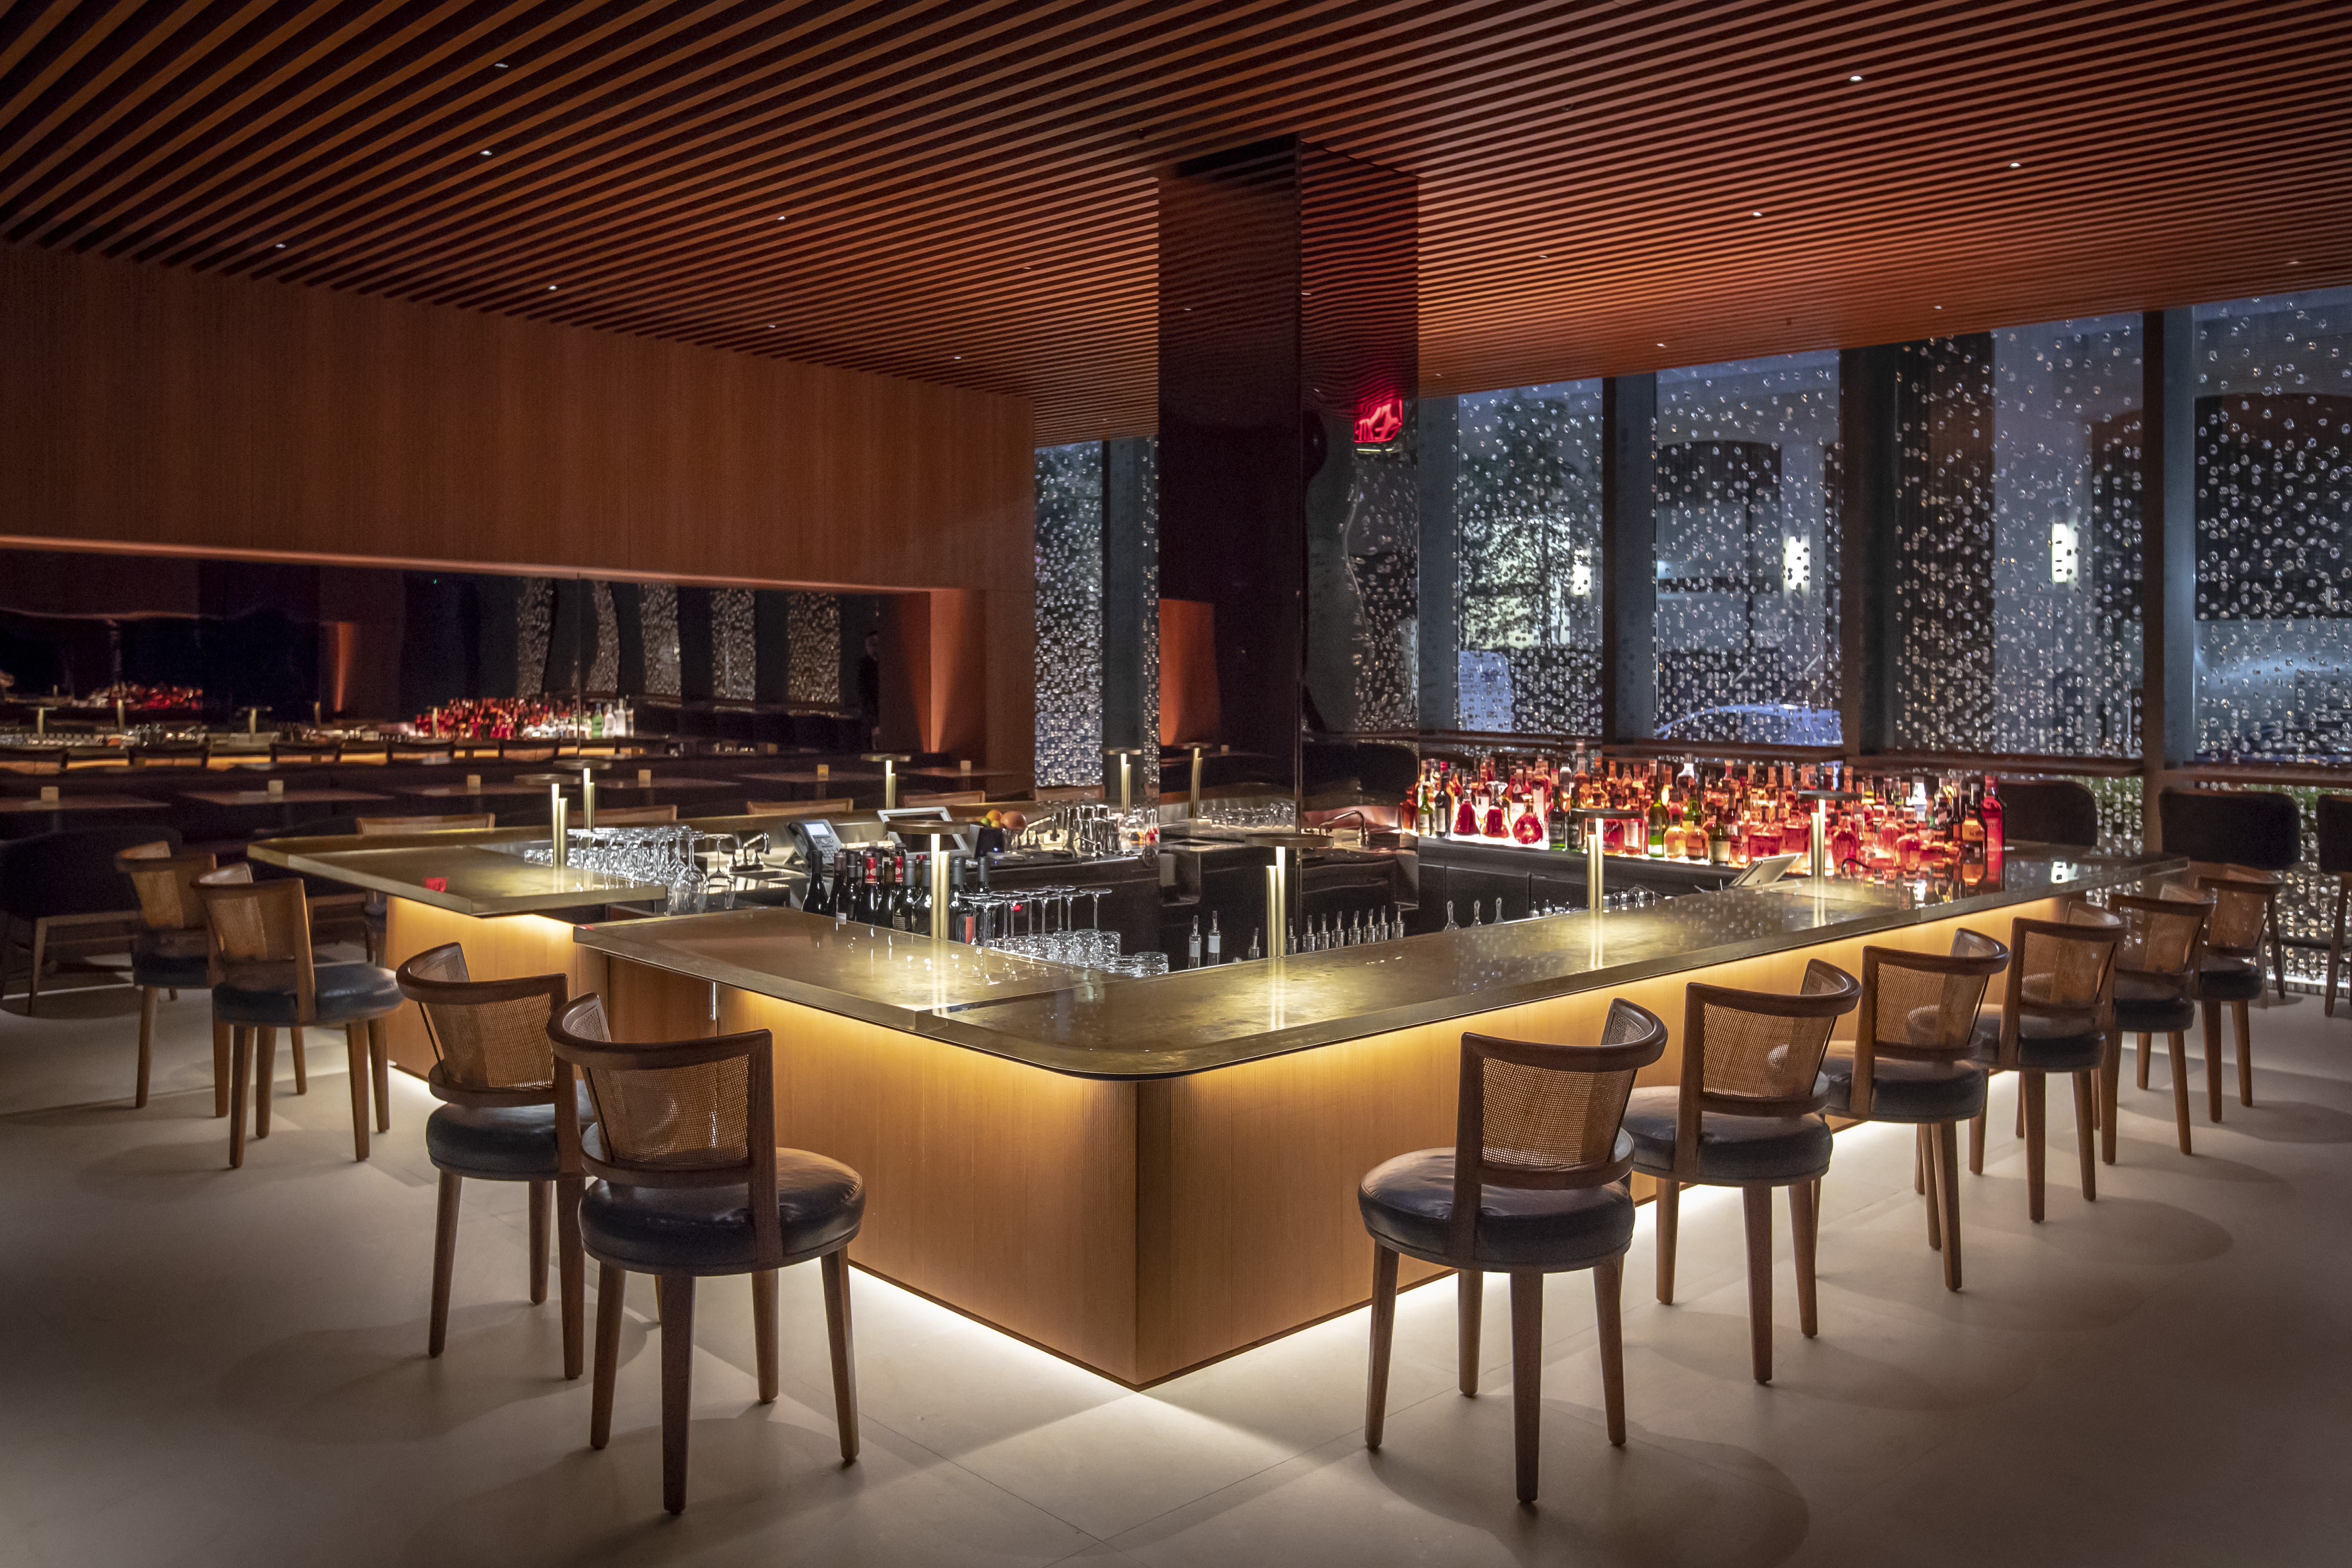 Four Seasons's new bar room